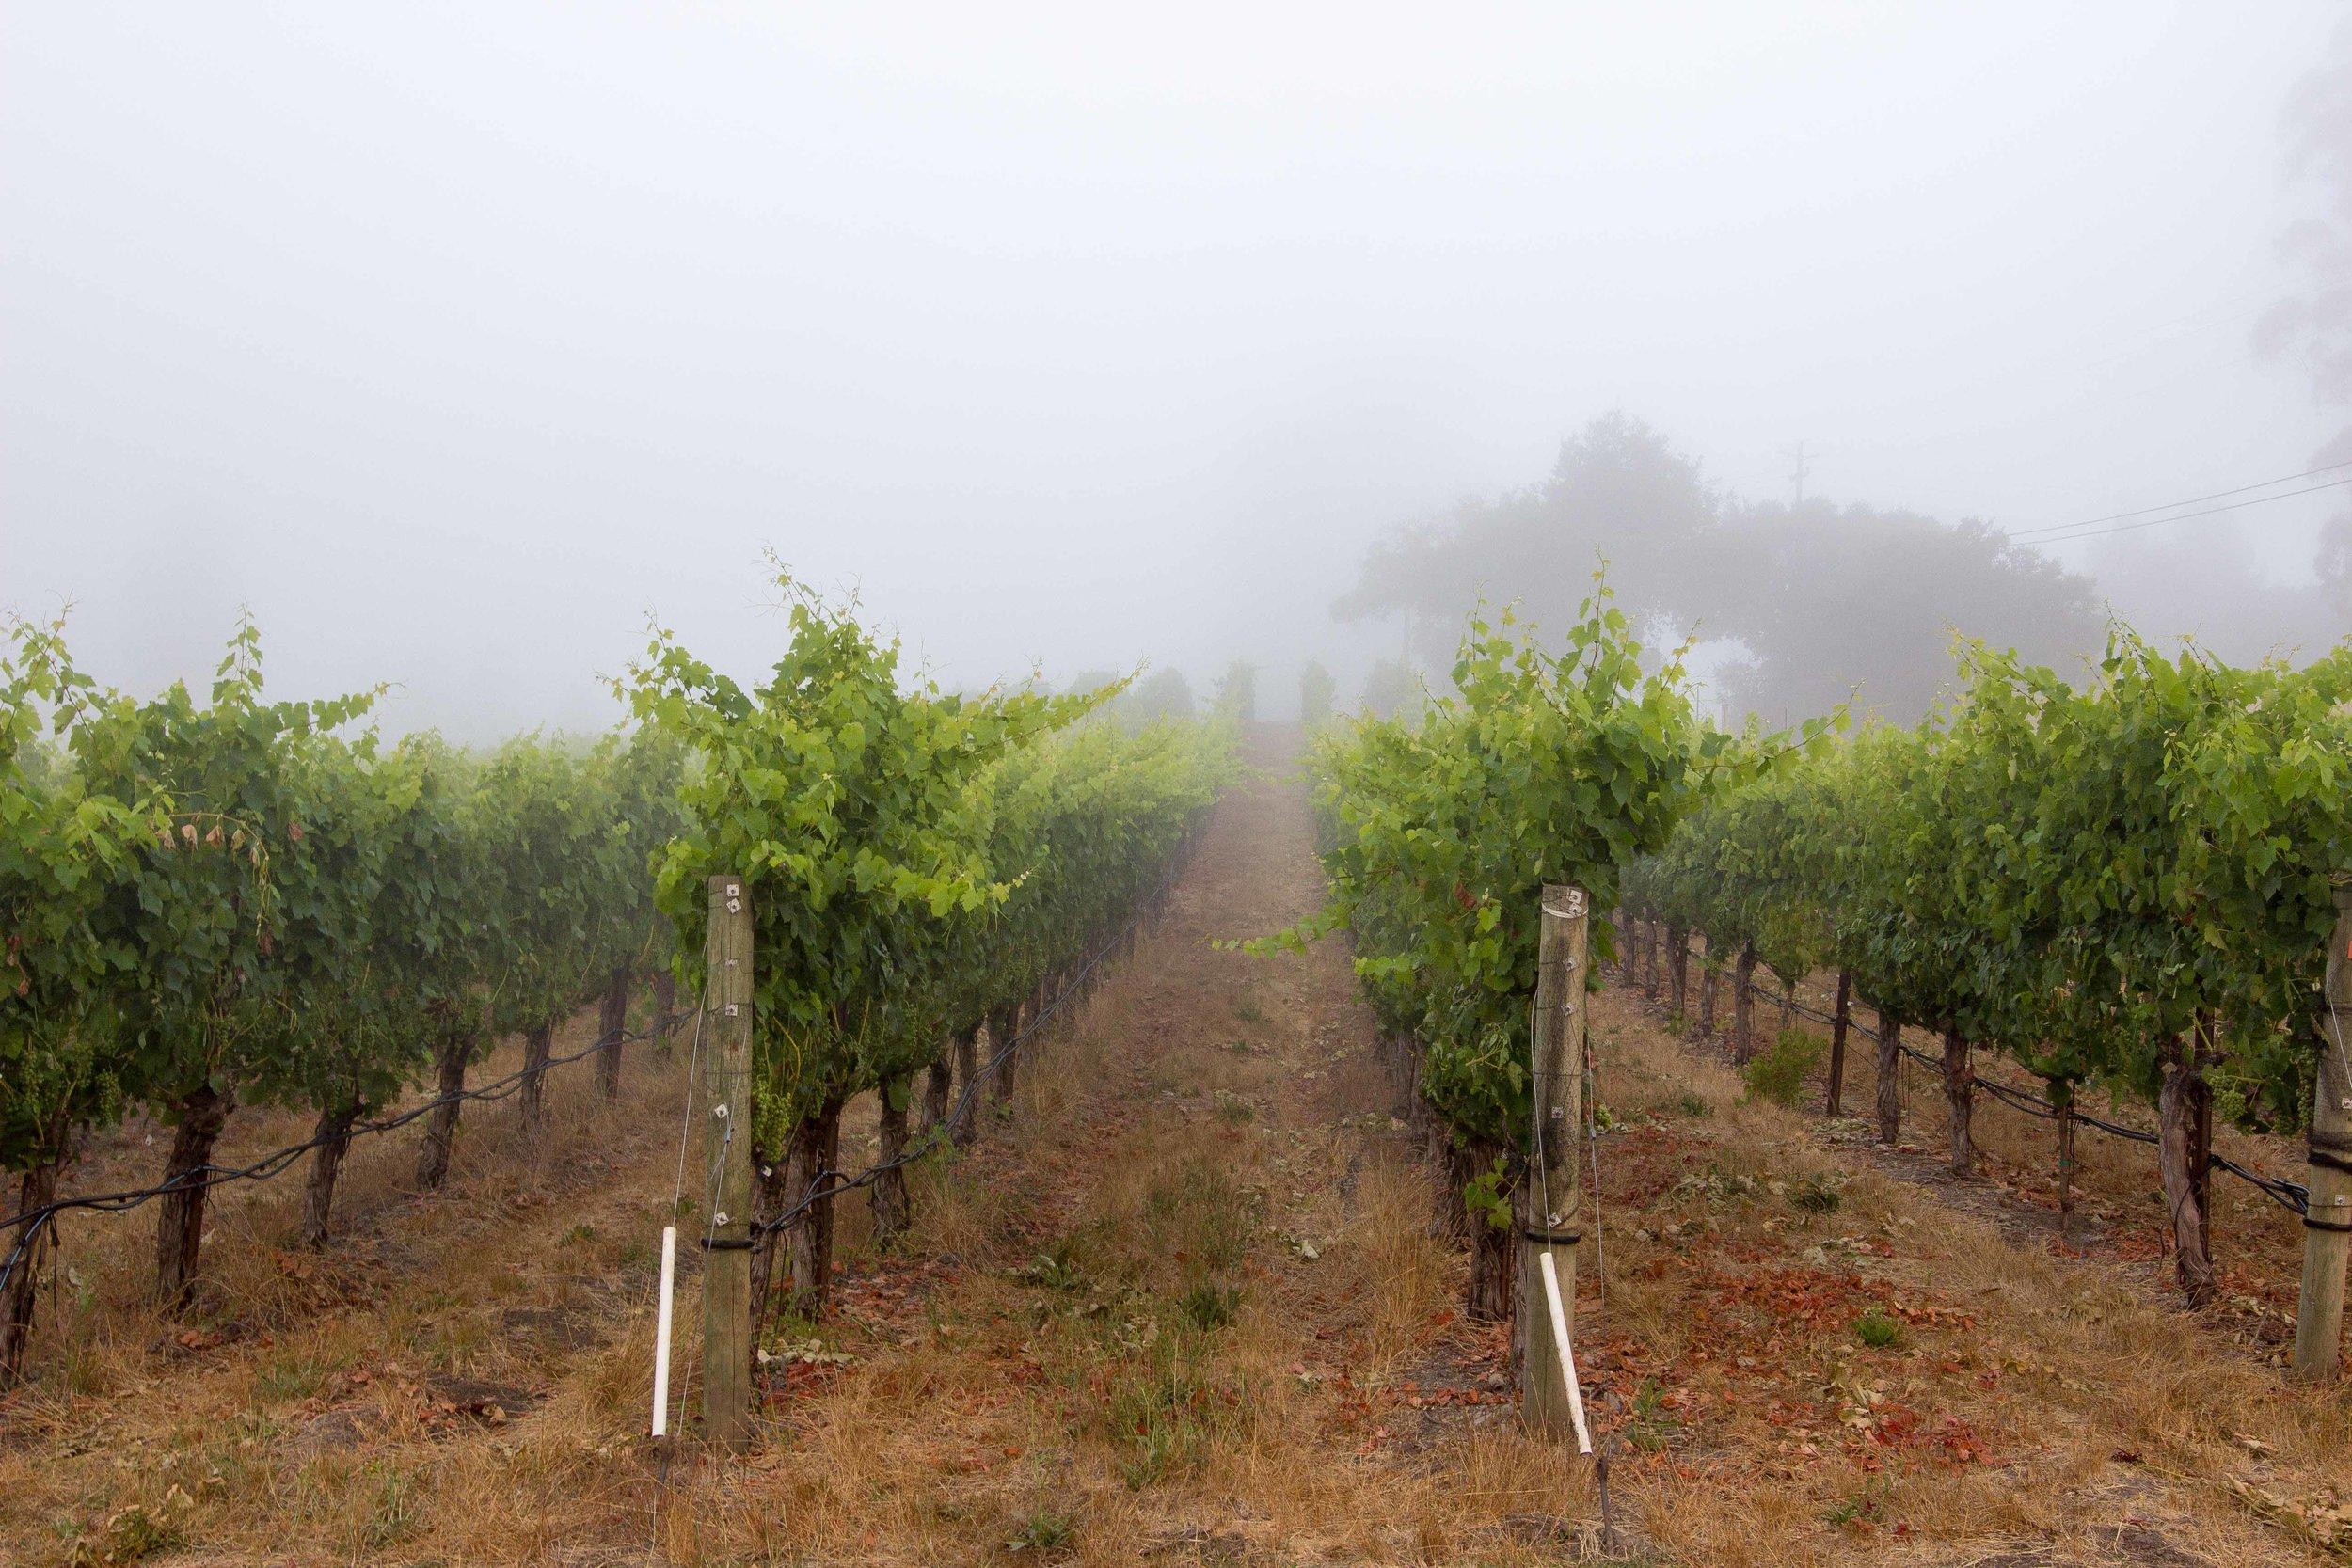 Fog in the Vineyards